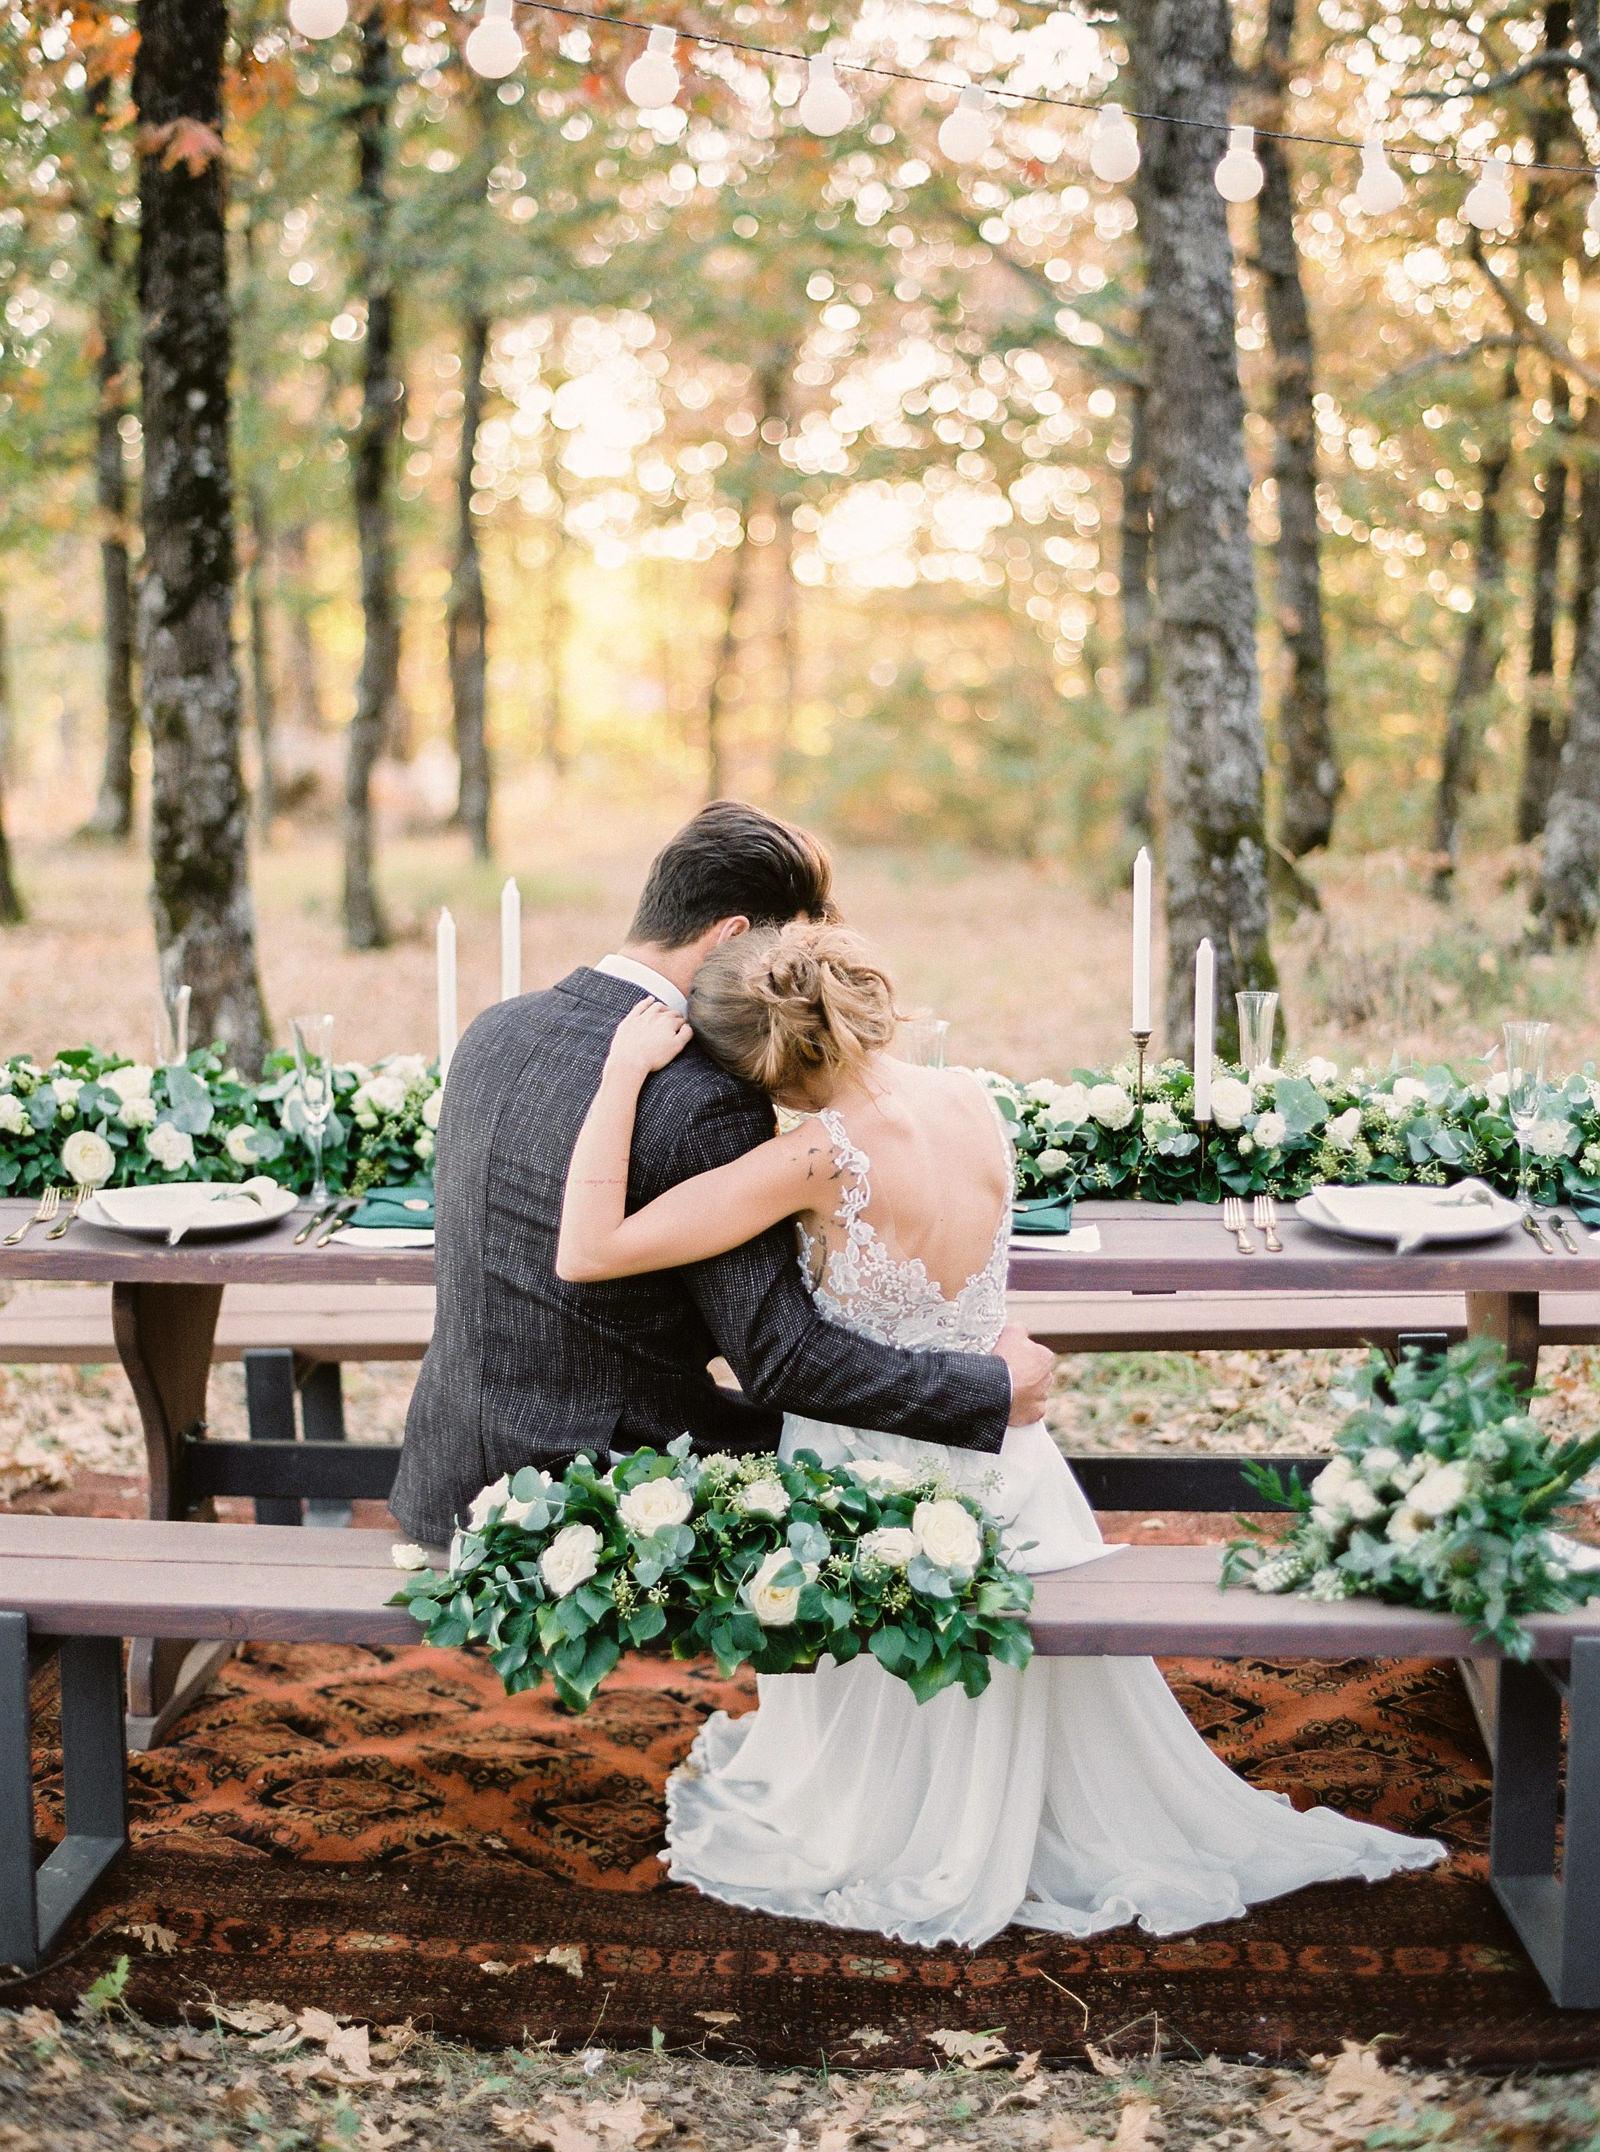 Bridal dress: ALKMINI, Photo credits: The Secret Owl Team